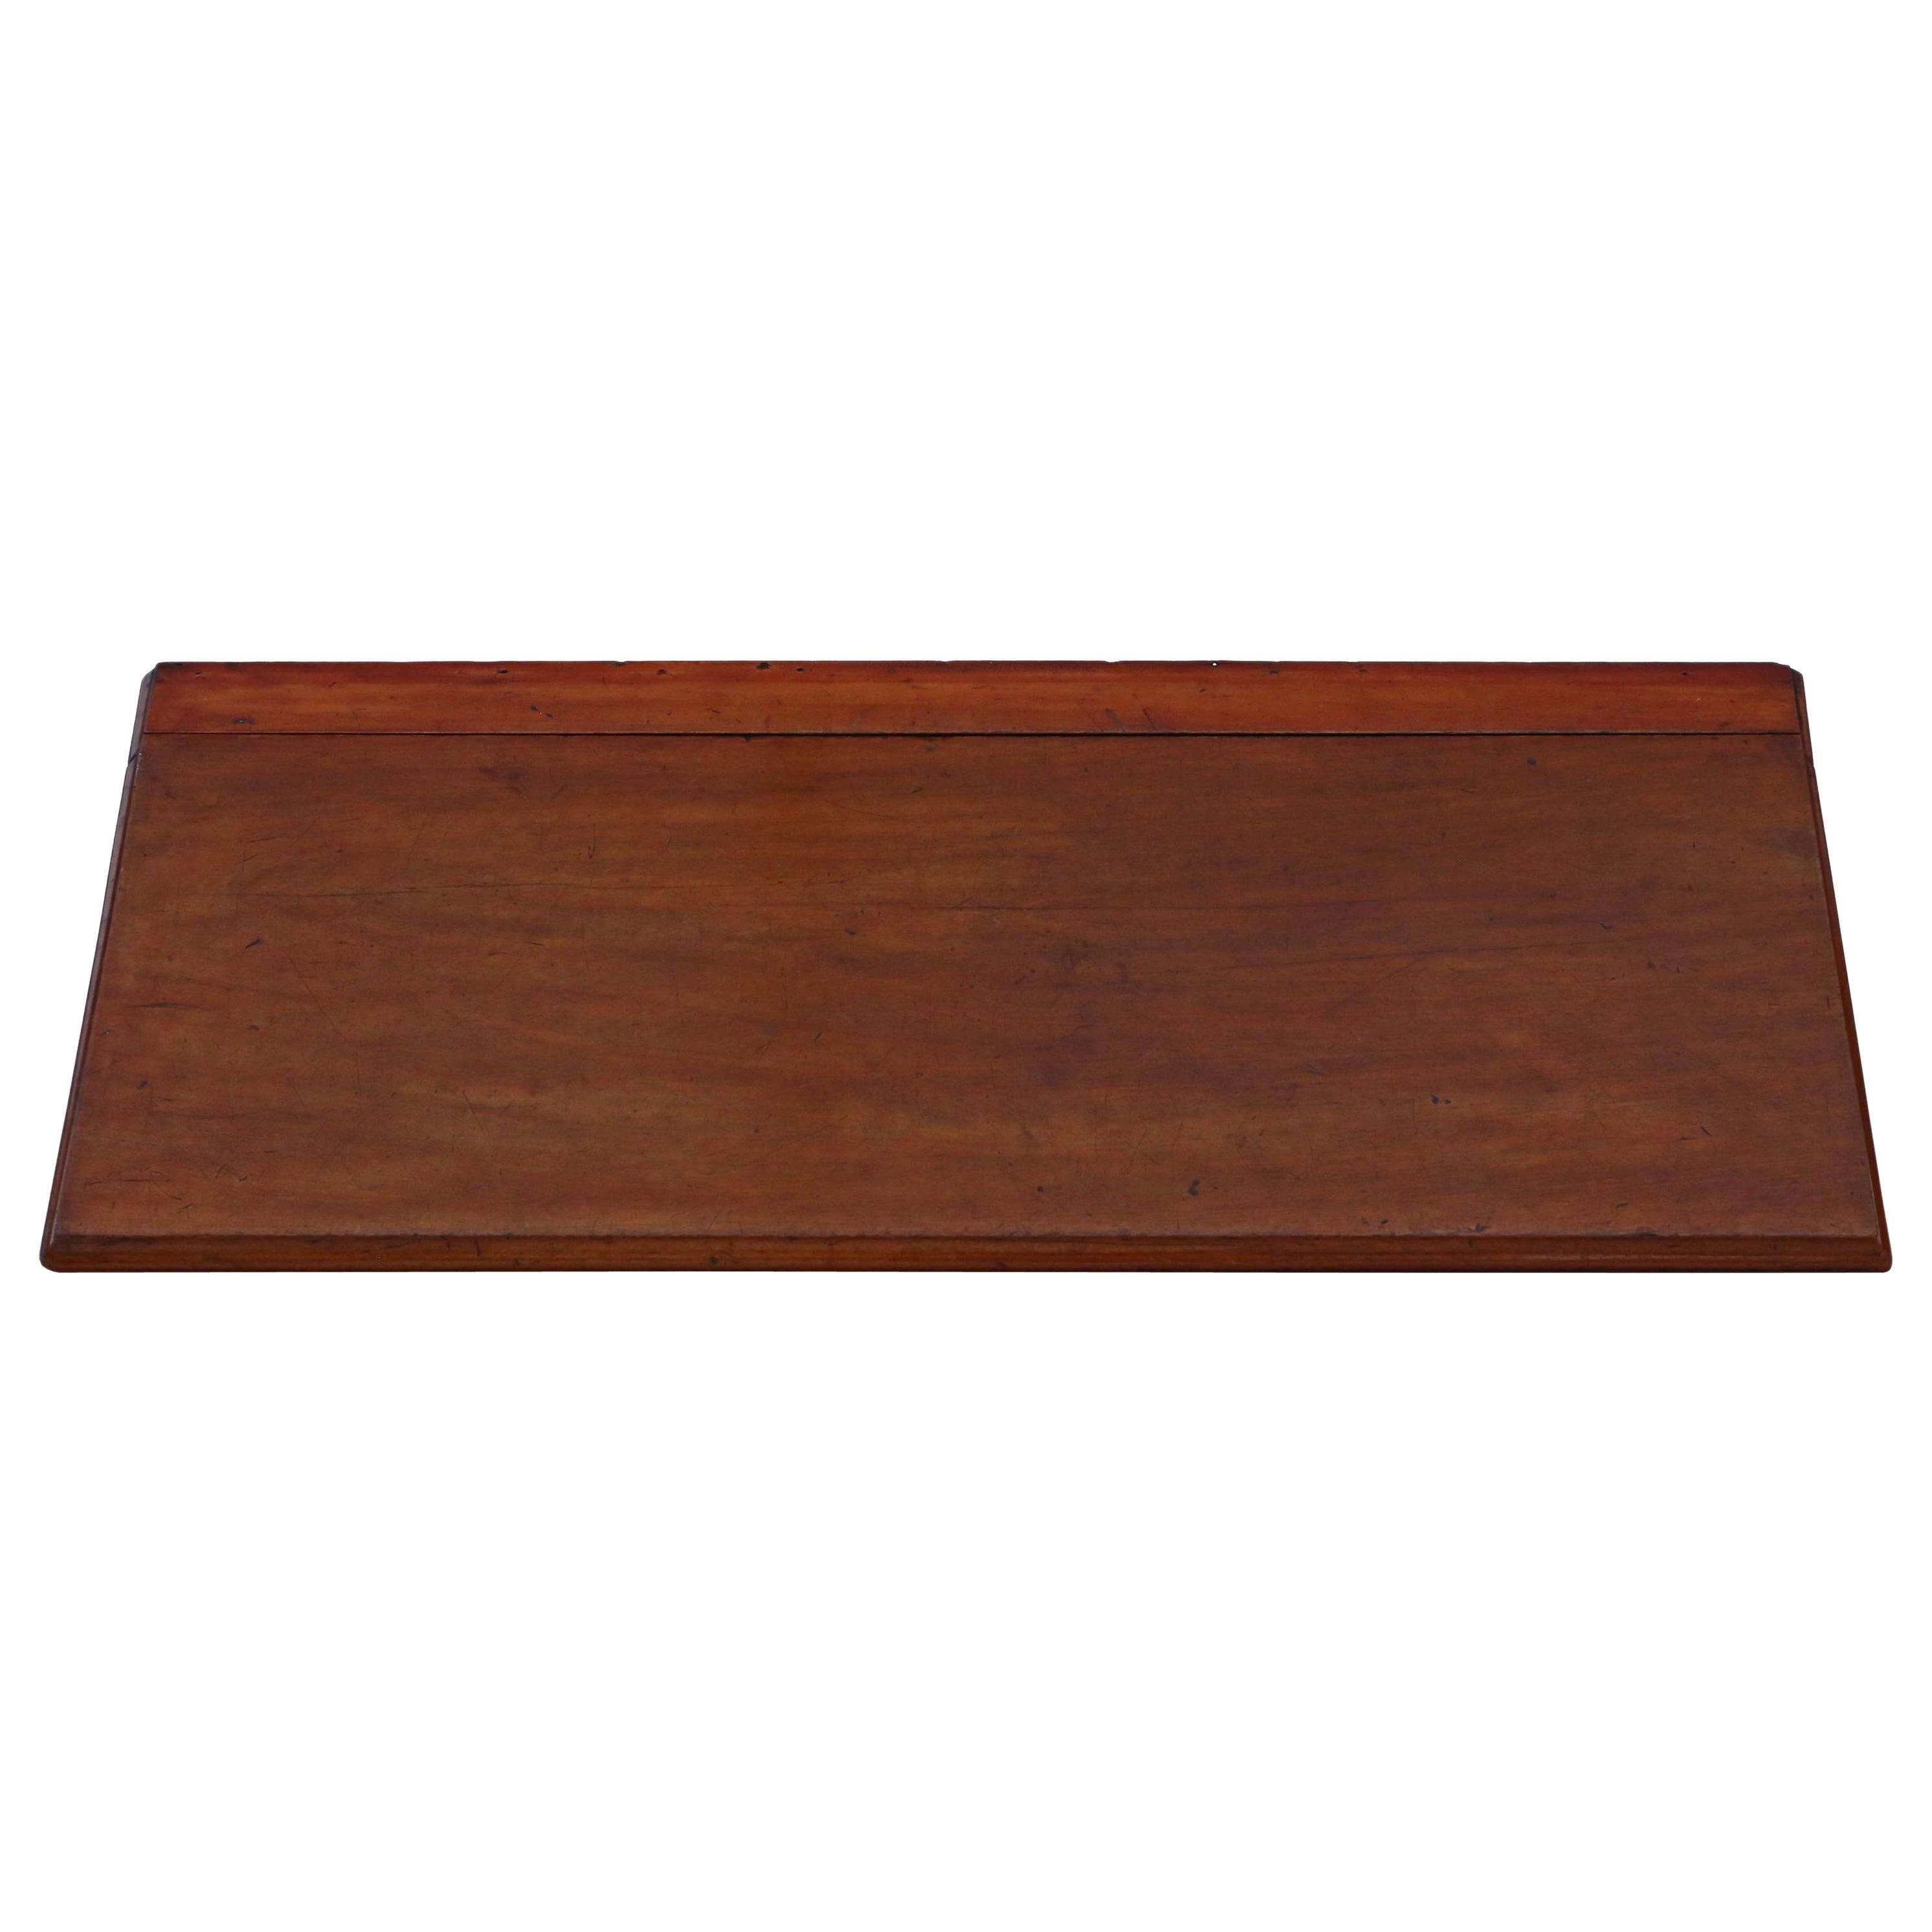 Antique 19th Century Mahogany Folding Butler's Table or Shelf